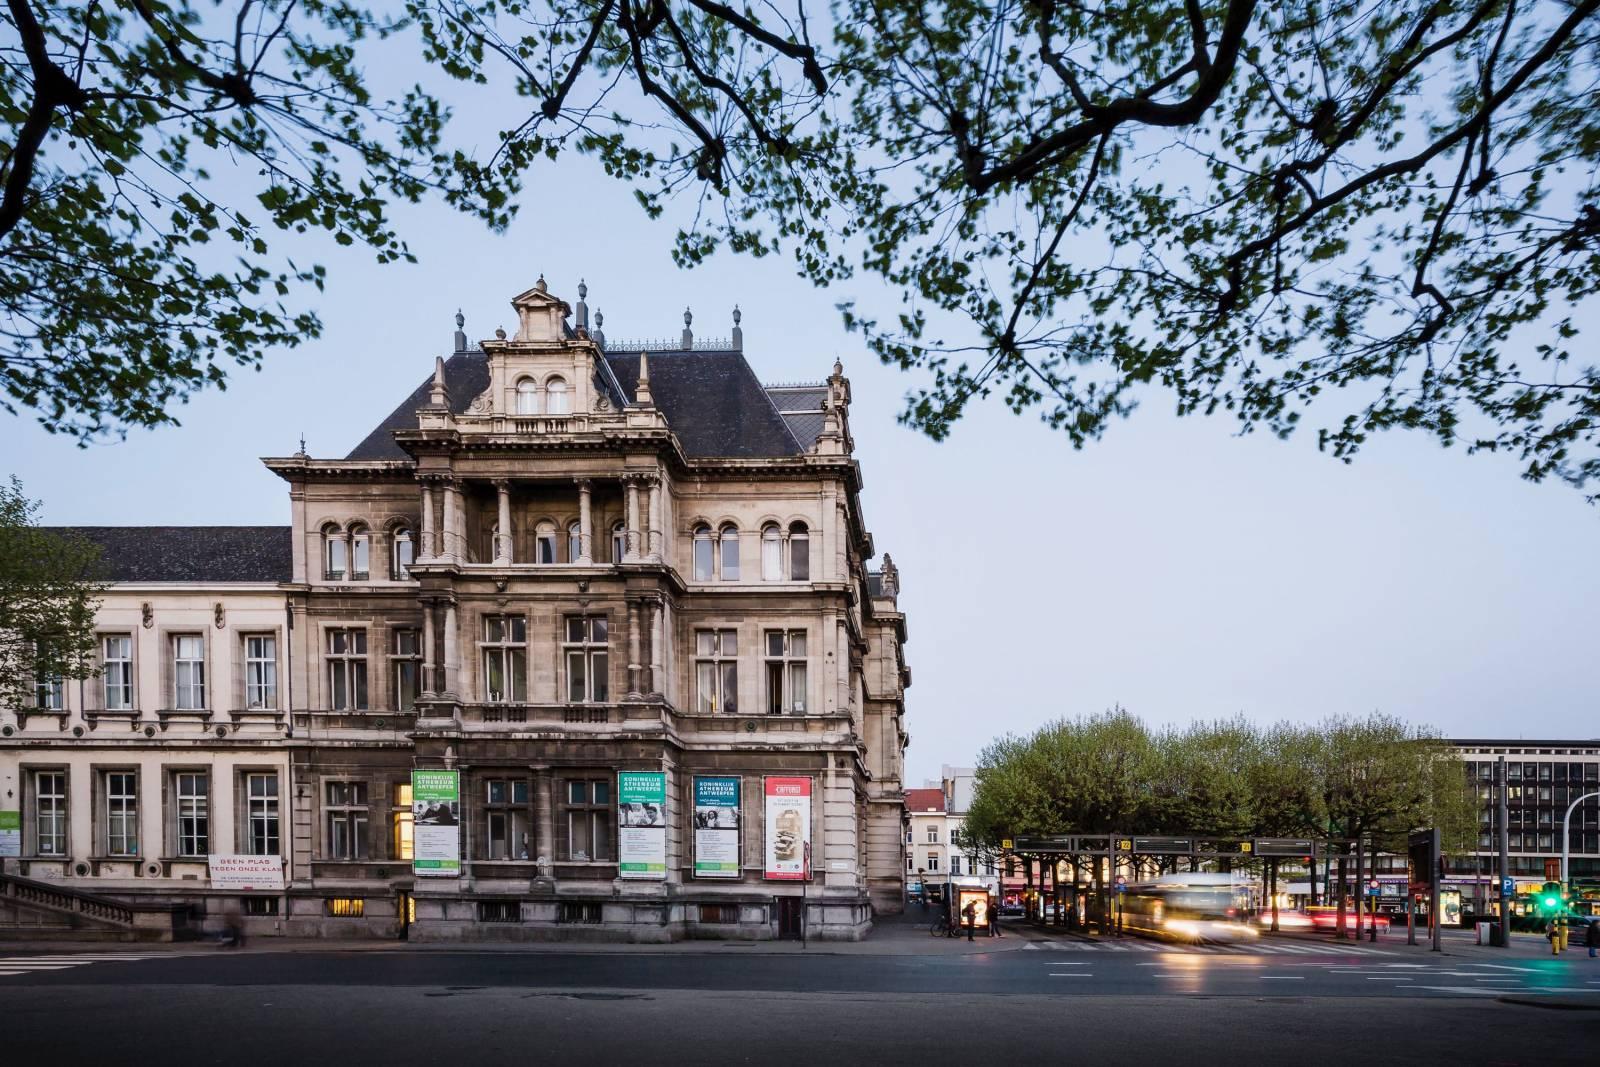 Zaal AthenA - Feestzaal - Trouwzaal - Antwerpen - House of Weddings - 2